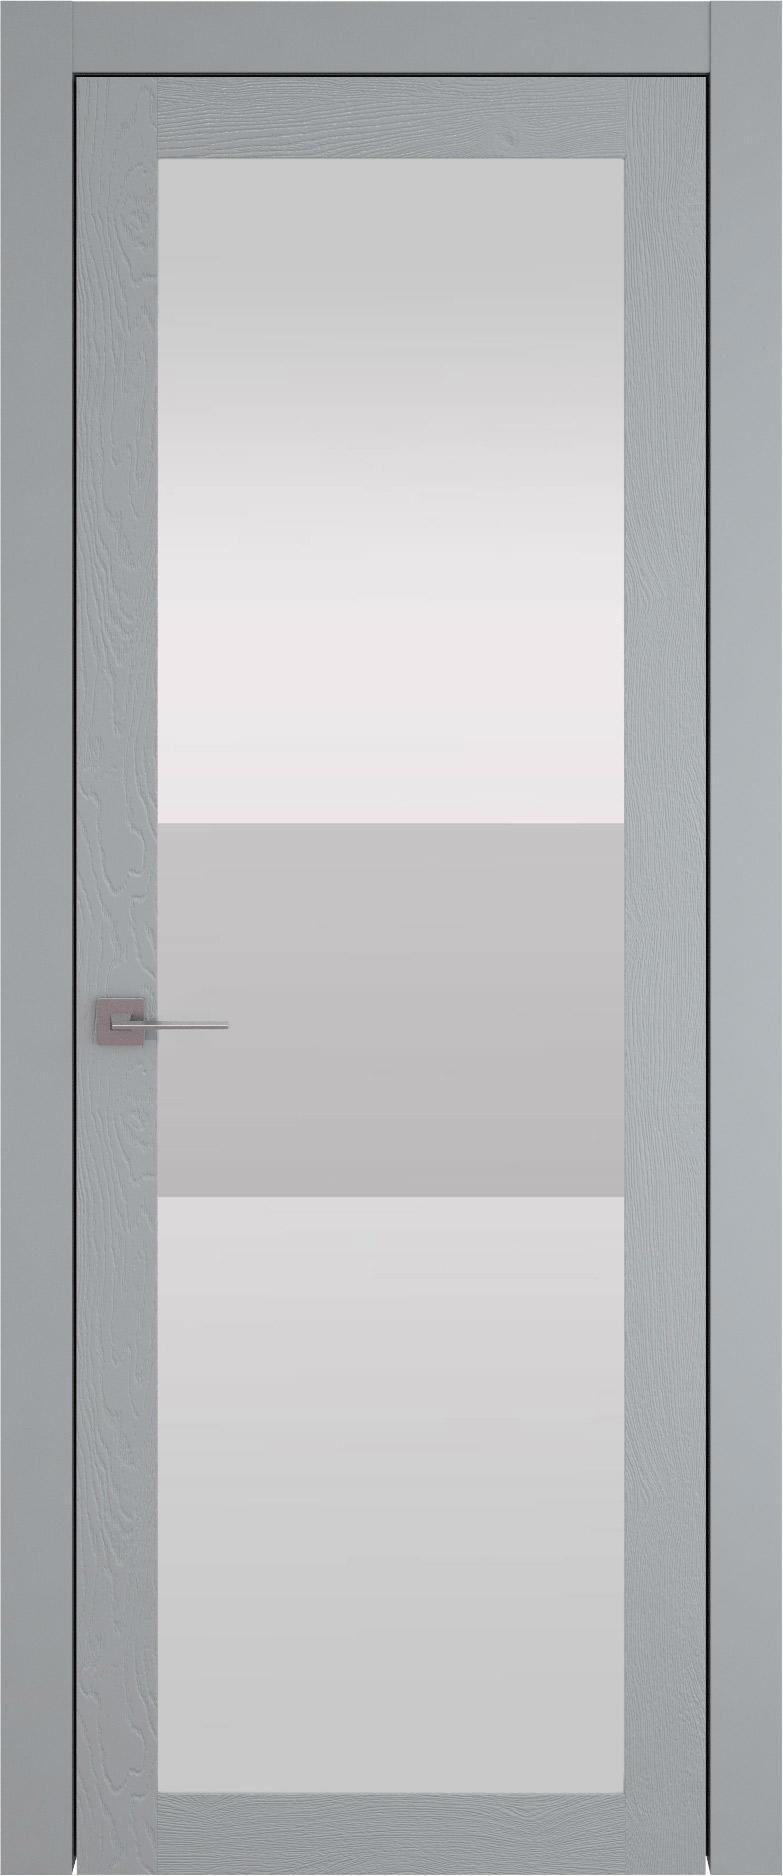 Tivoli З-4 цвет - Серебристо-серая эмаль по шпону (RAL 7045) Со стеклом (ДО)